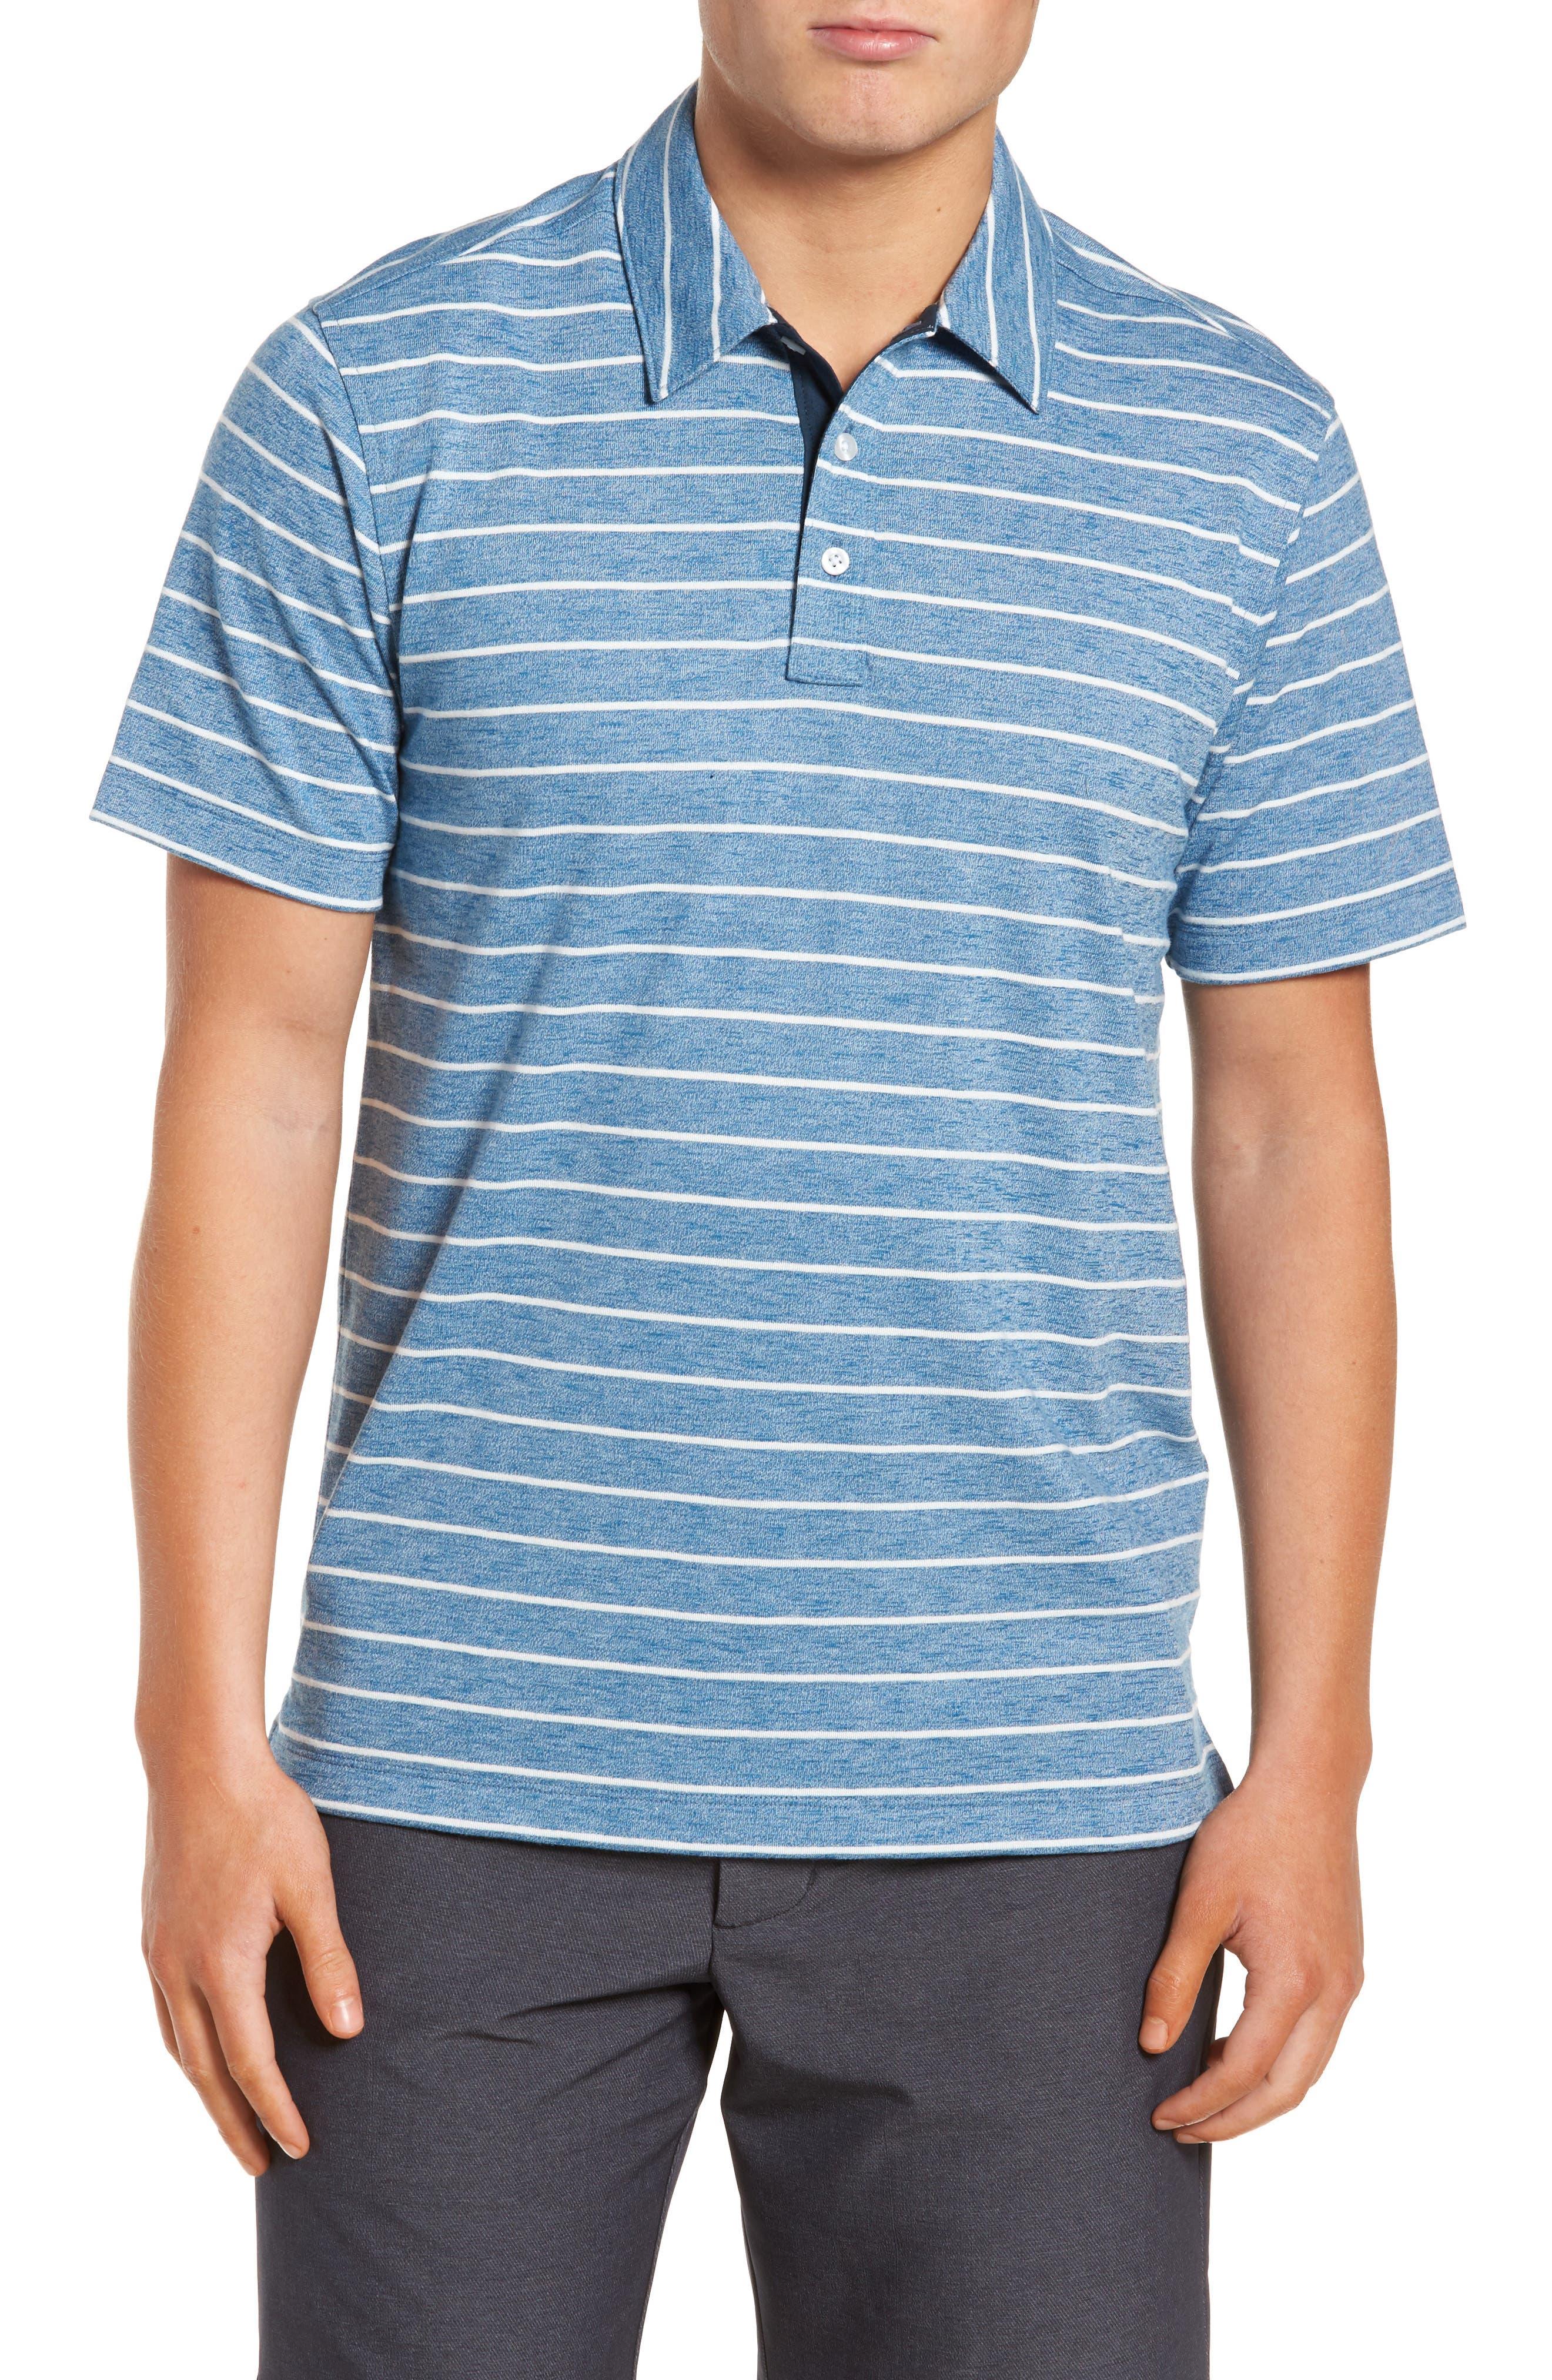 Nordstrom Men's Shop Stripe Polo (Big & Tall)